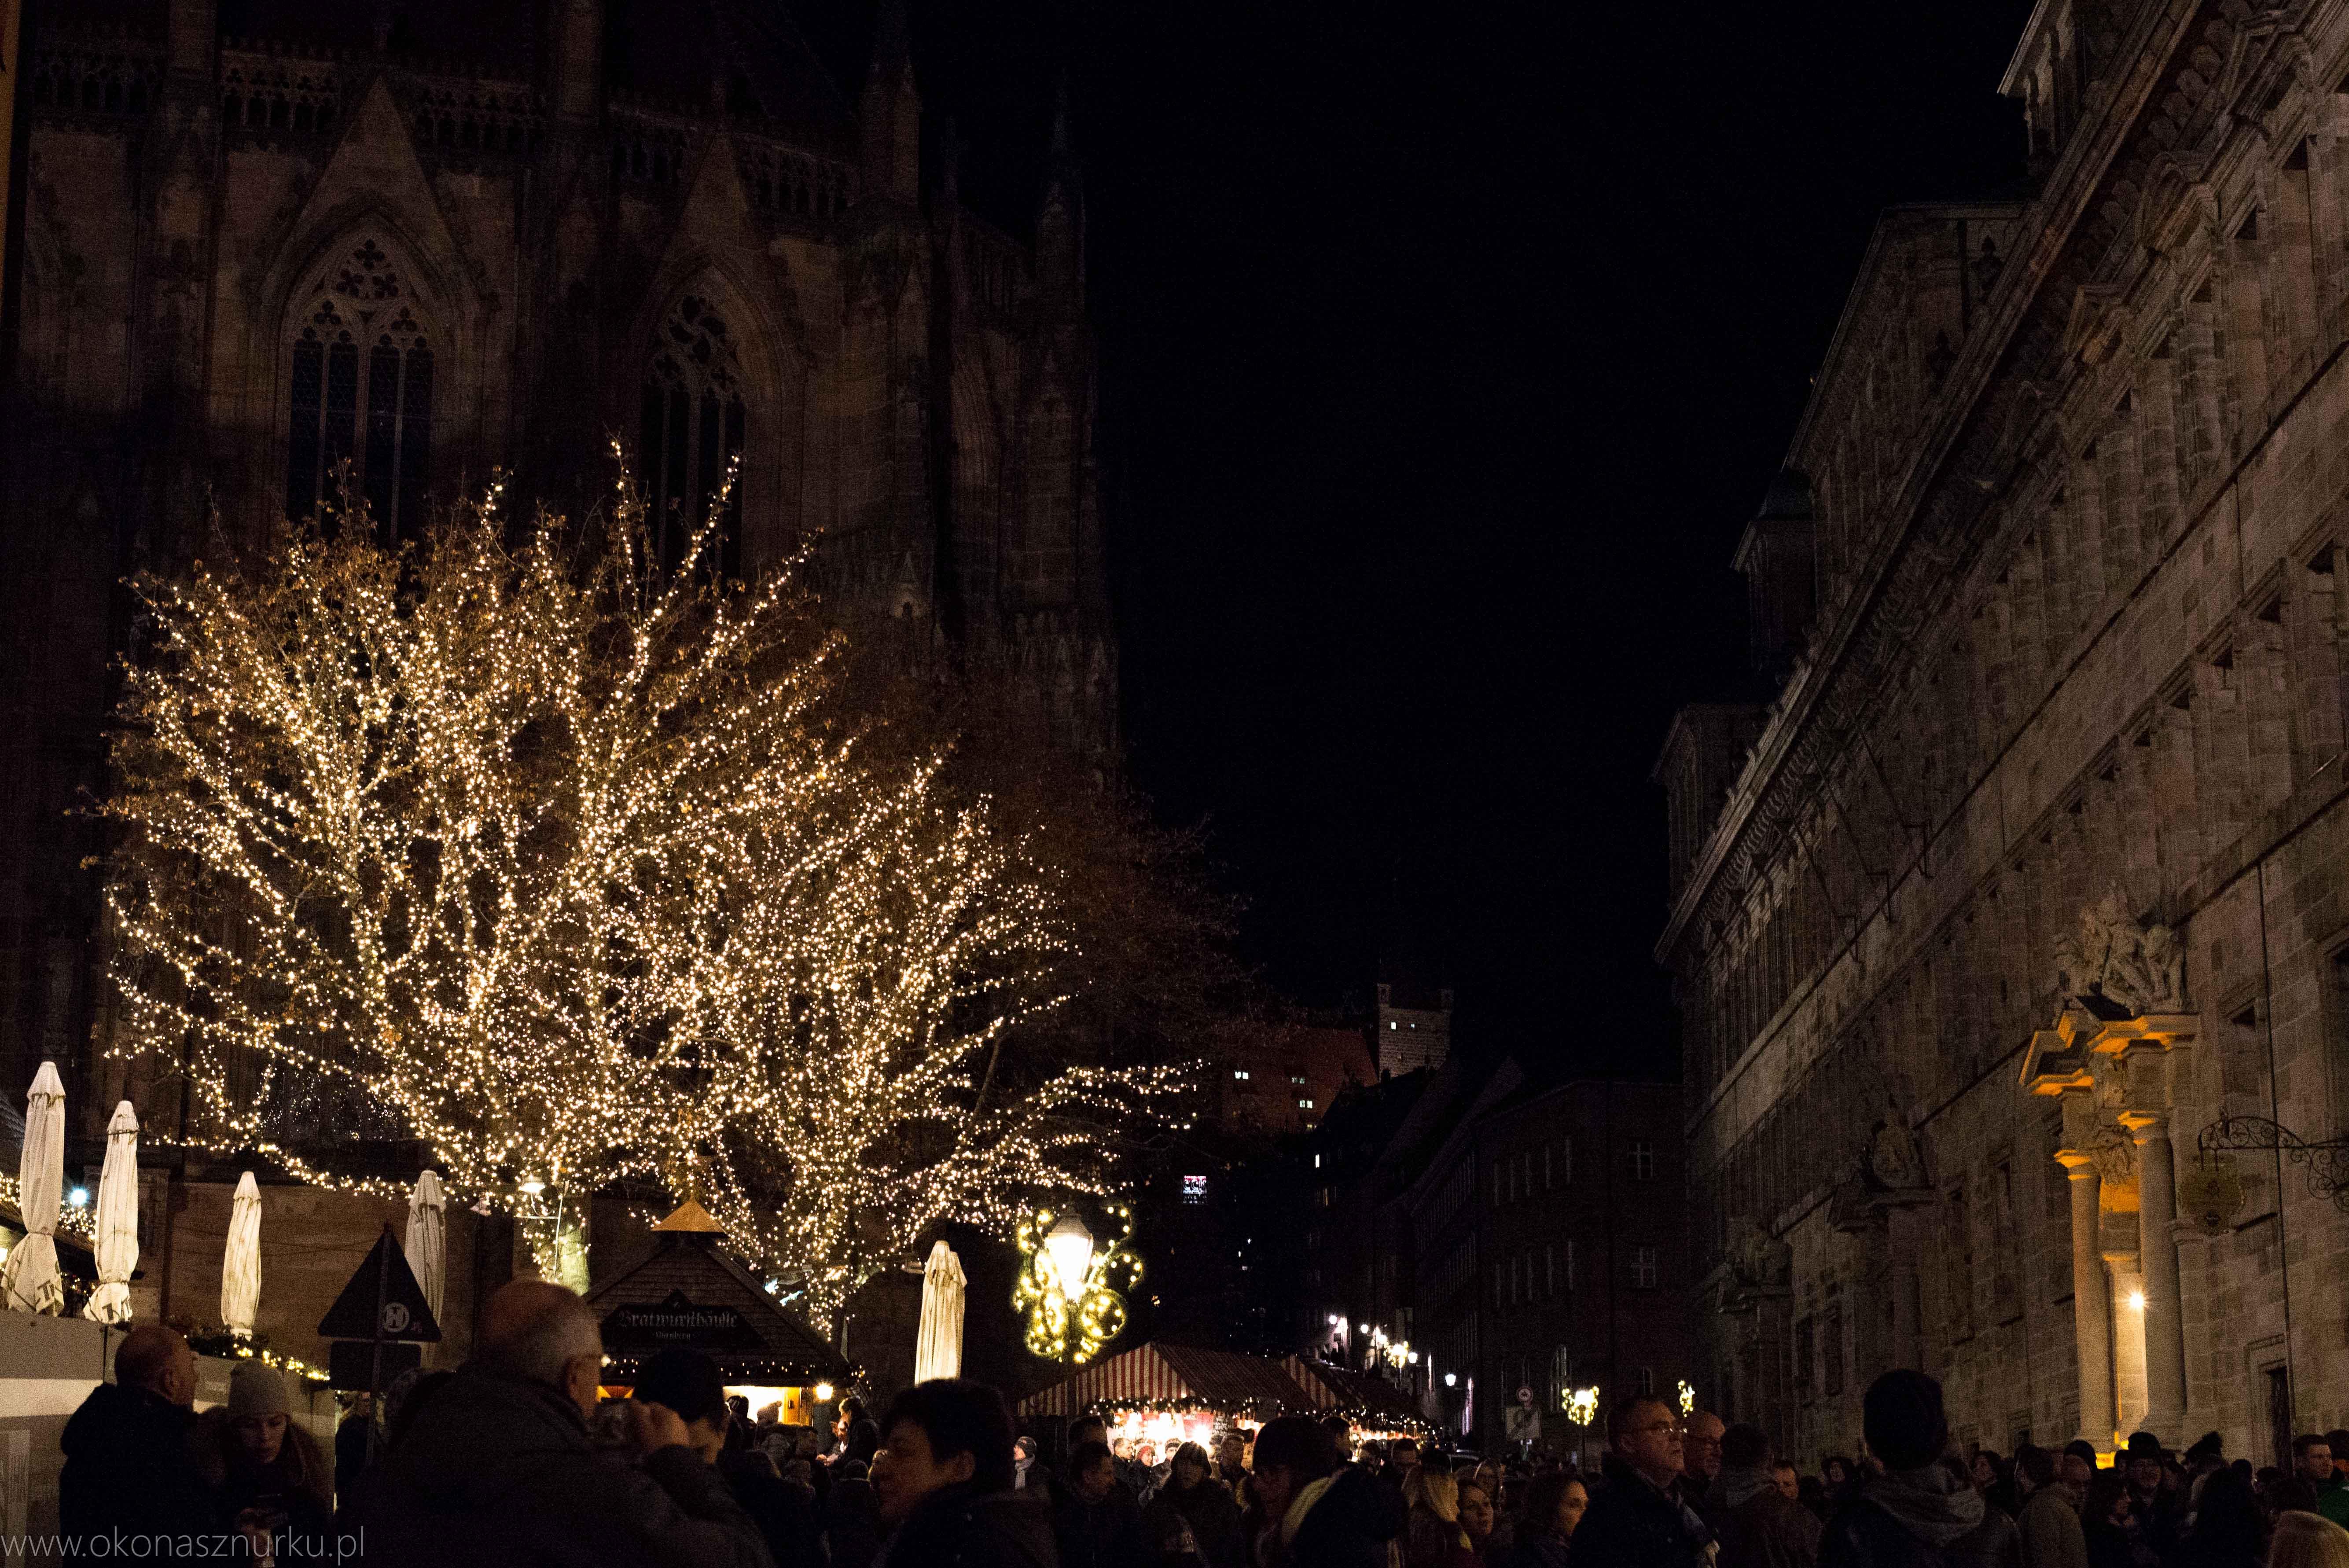 norymberga-weihnachtsmarkt-christmas-market-nurnberg (22)